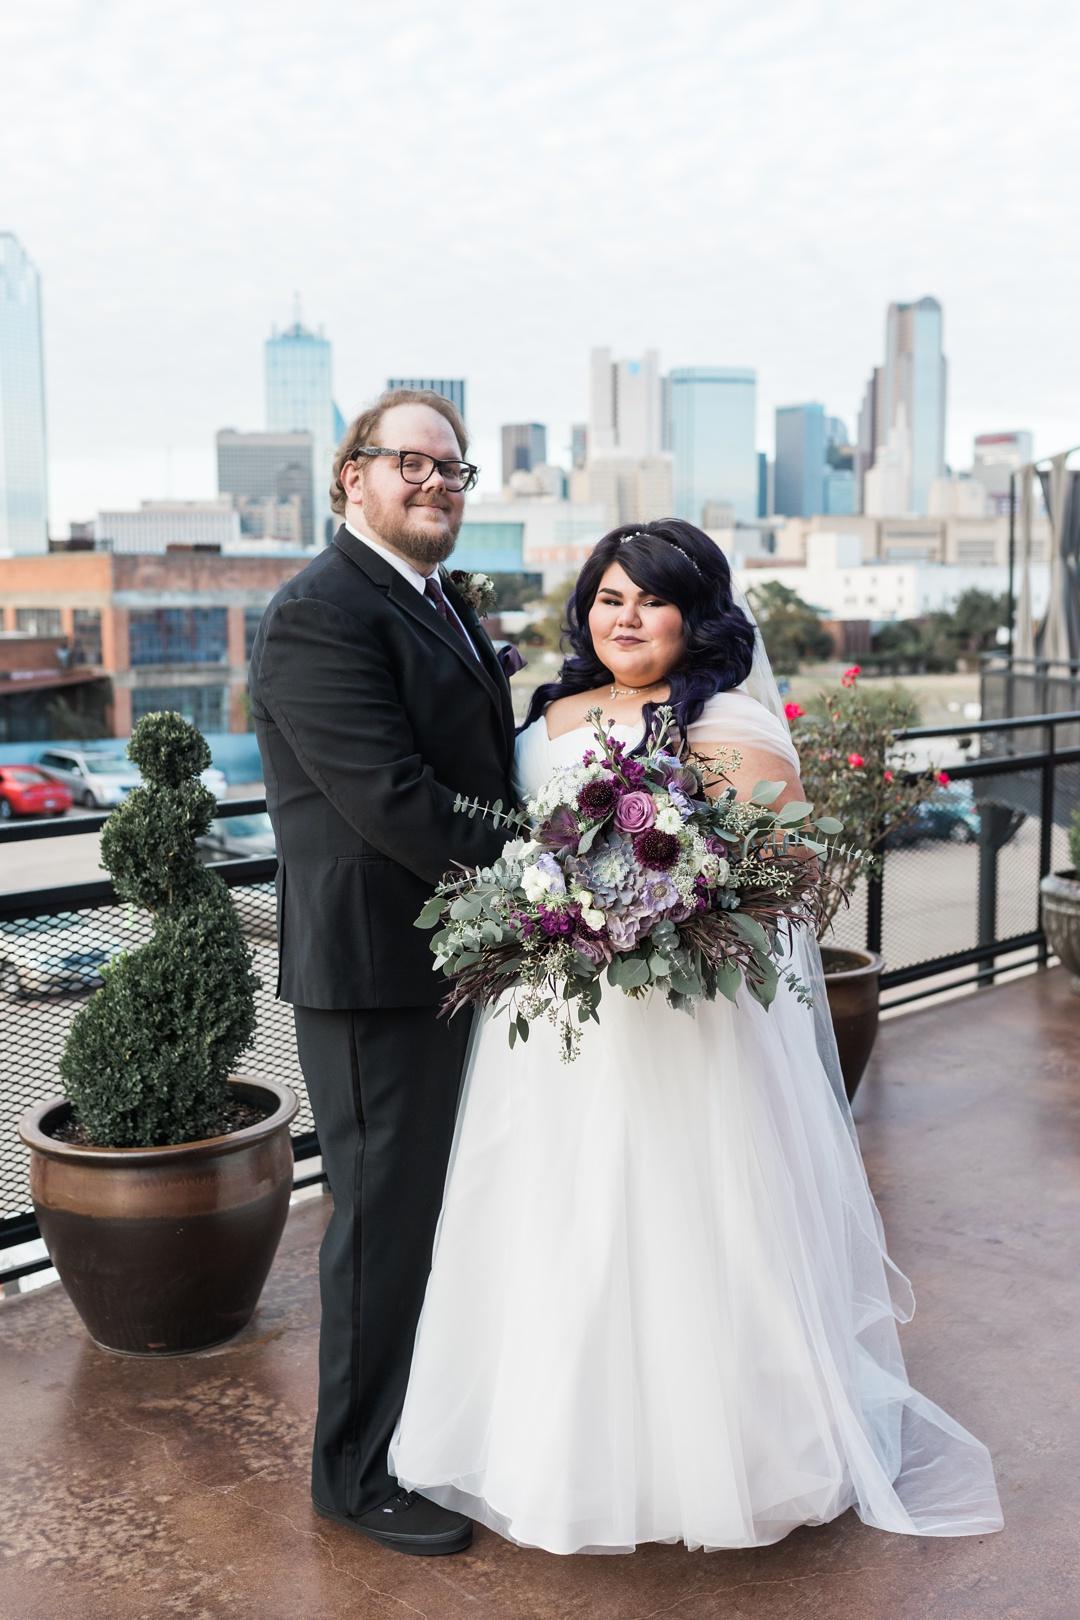 gilleys_dallas_wedding-34